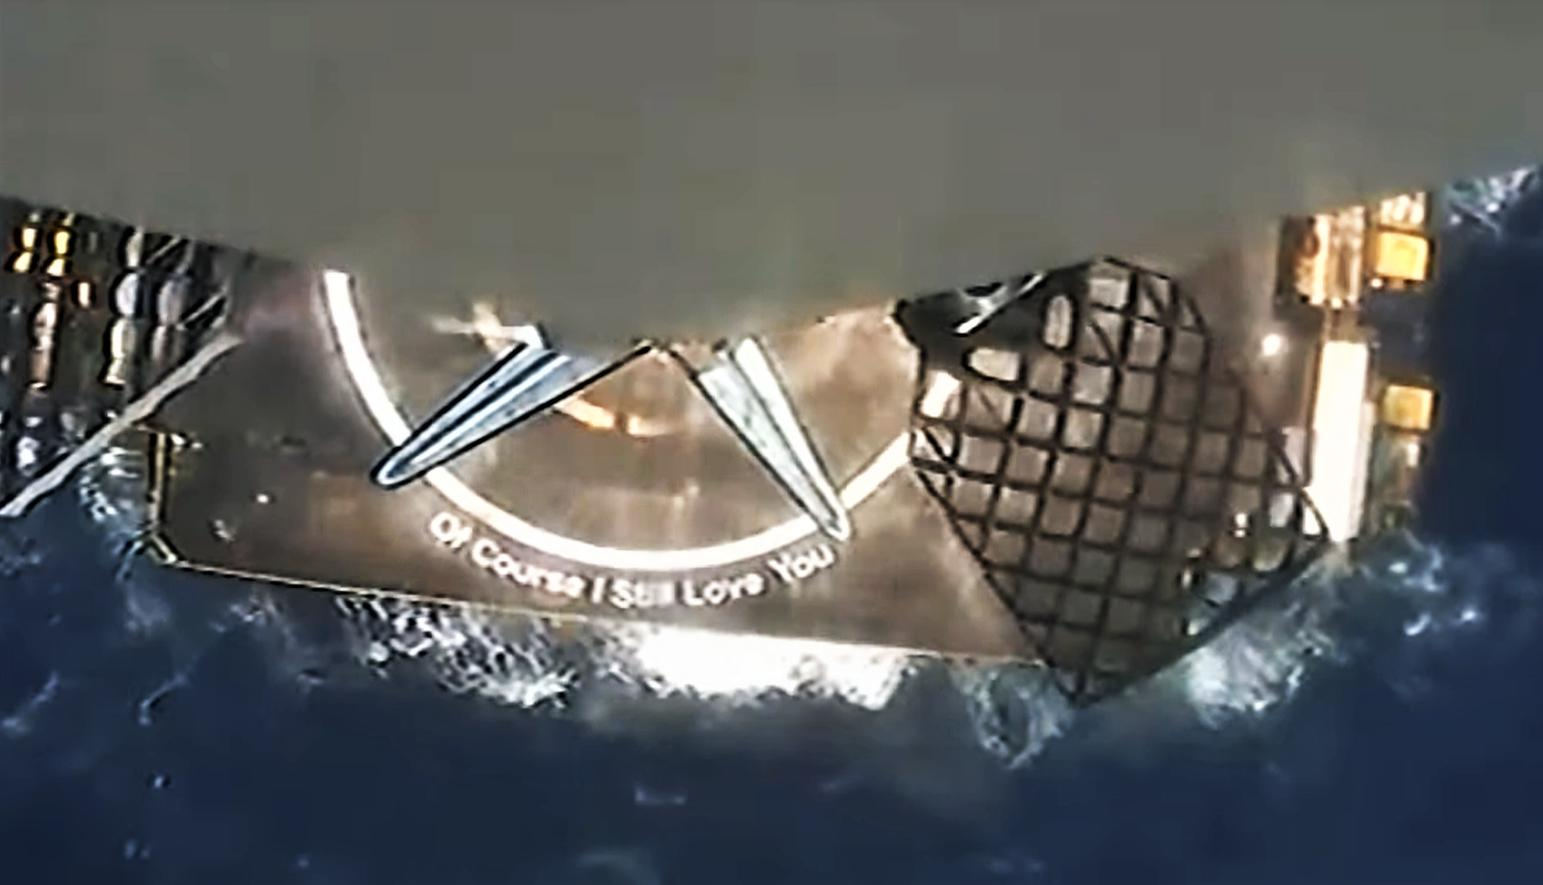 Starlink-26 Falcon 9 B1058 39A 051521 webcast (SpaceX) landing 9 crop